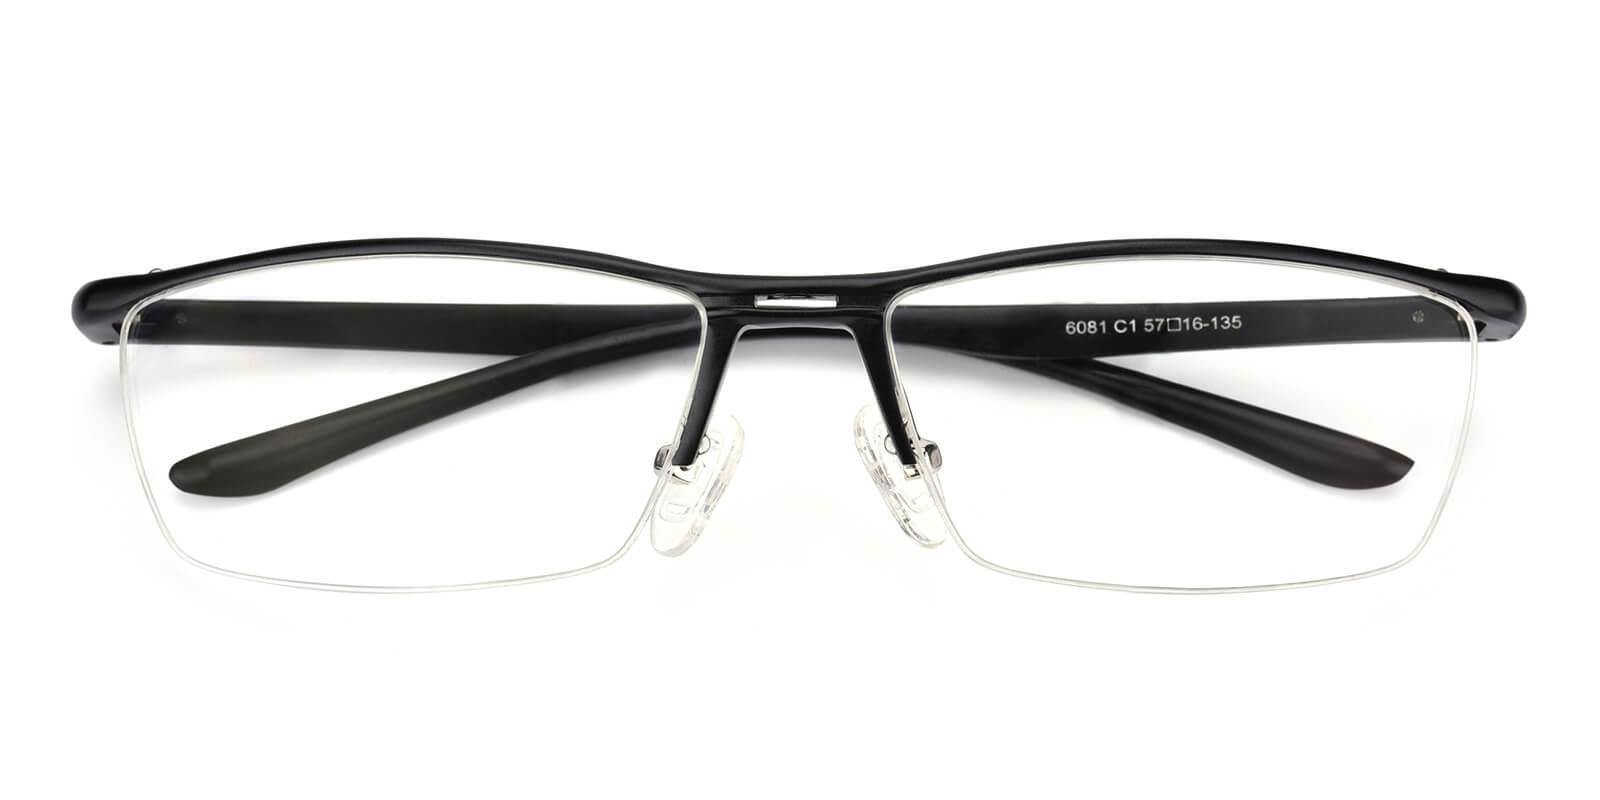 Vauseper-Black-Rectangle-Metal-Eyeglasses-detail